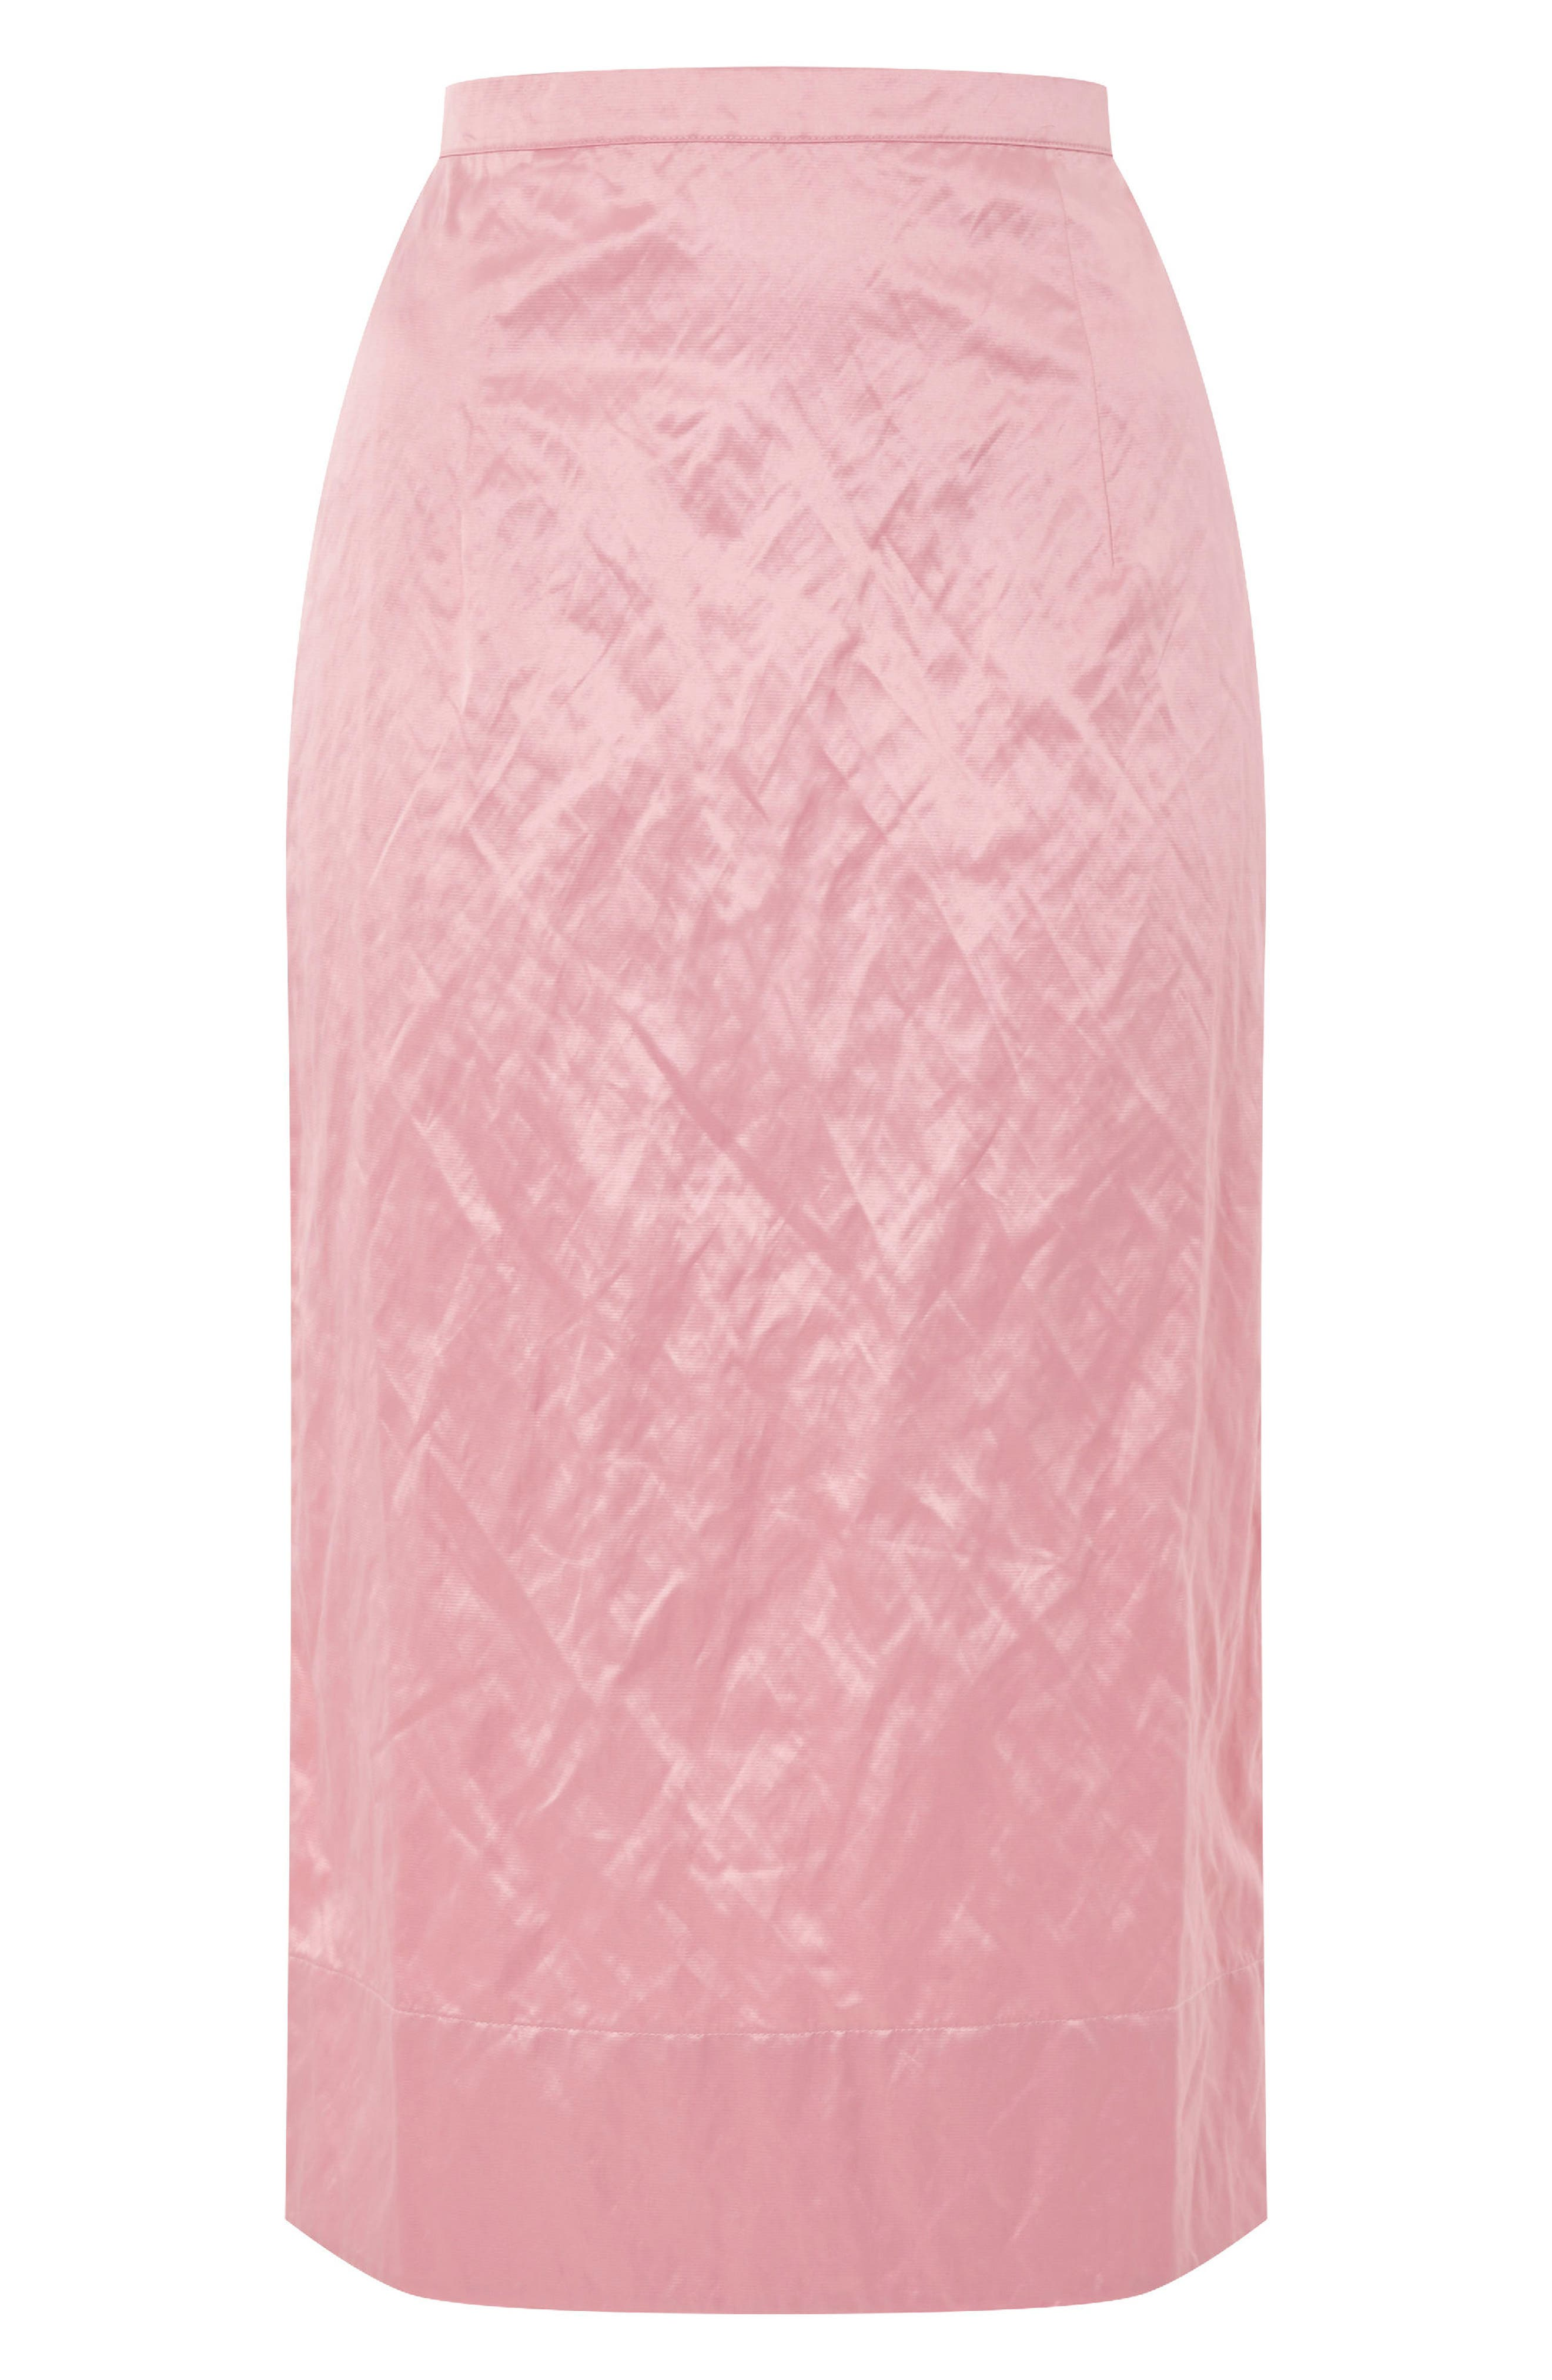 Topshop Boutique Rigid Crinkle Skirt